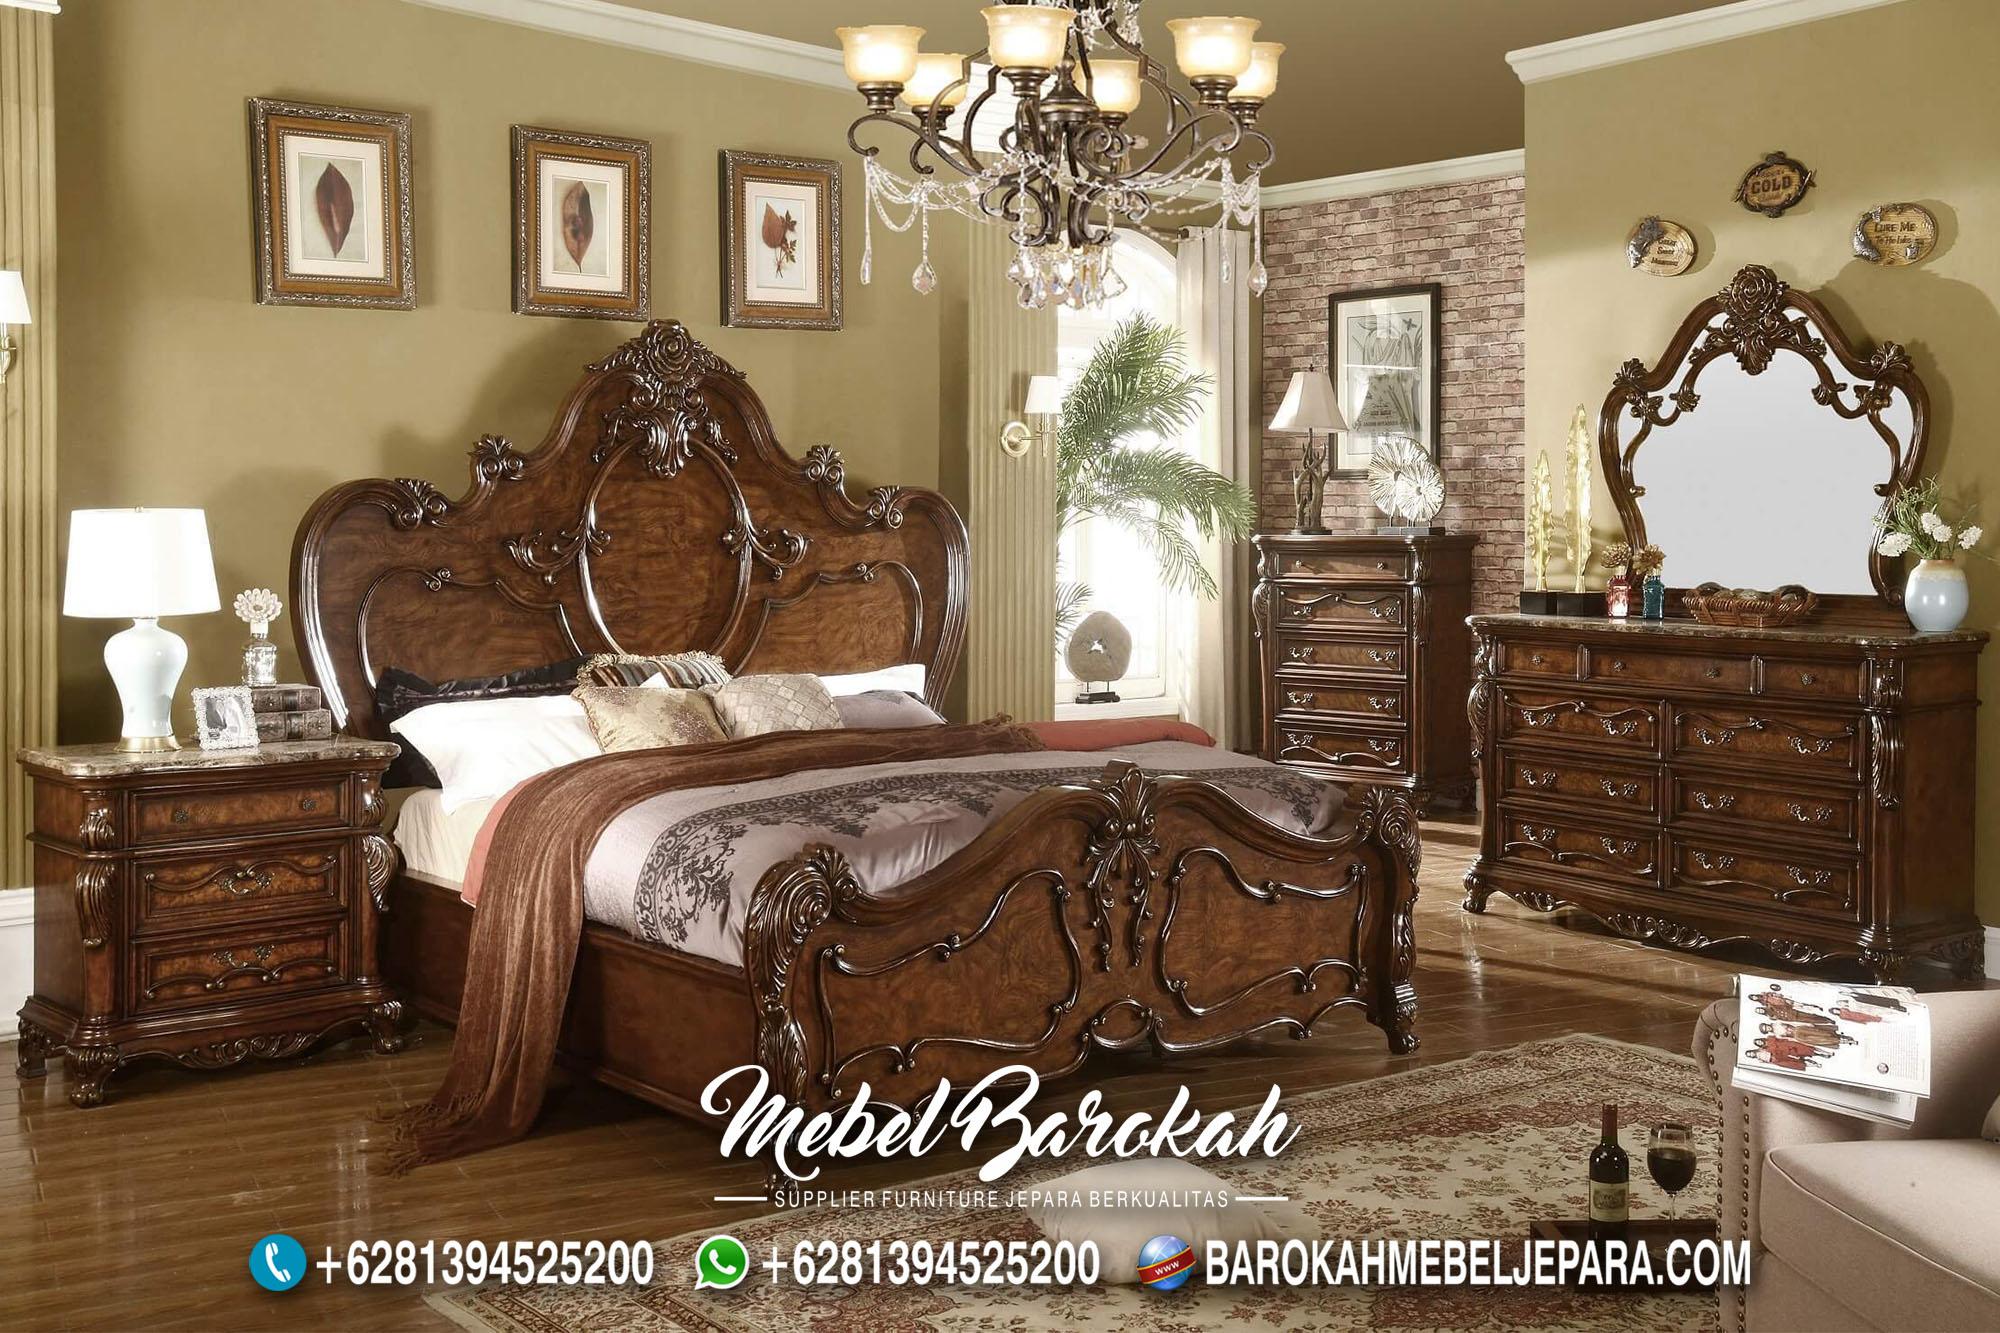 Jual Bed Set Natural kayu Jati Ukir Jepara MB-680